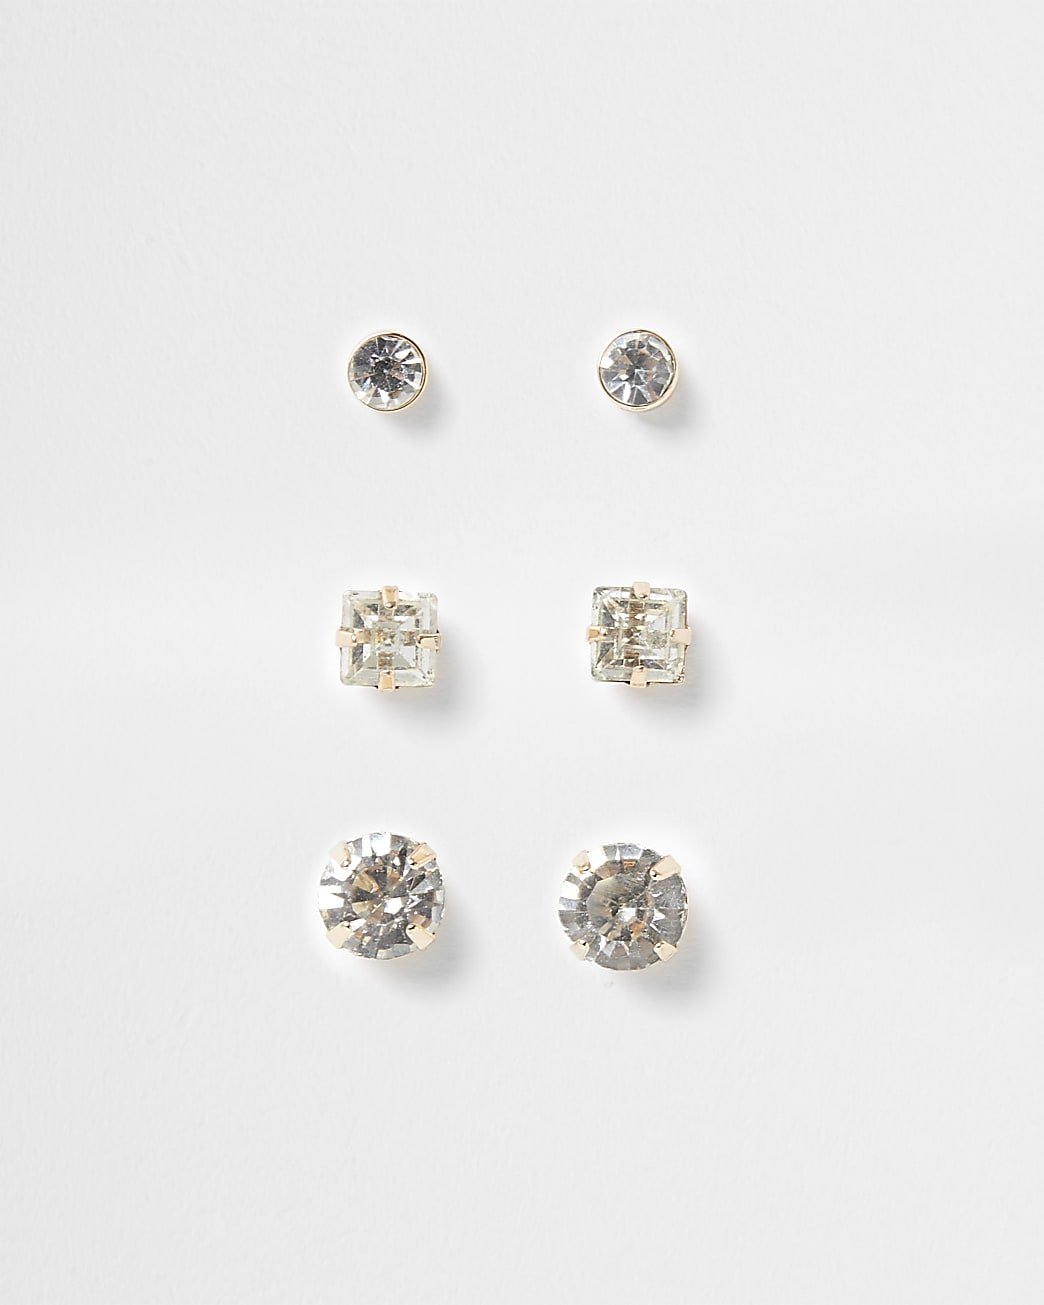 Gold diamante stud earrings